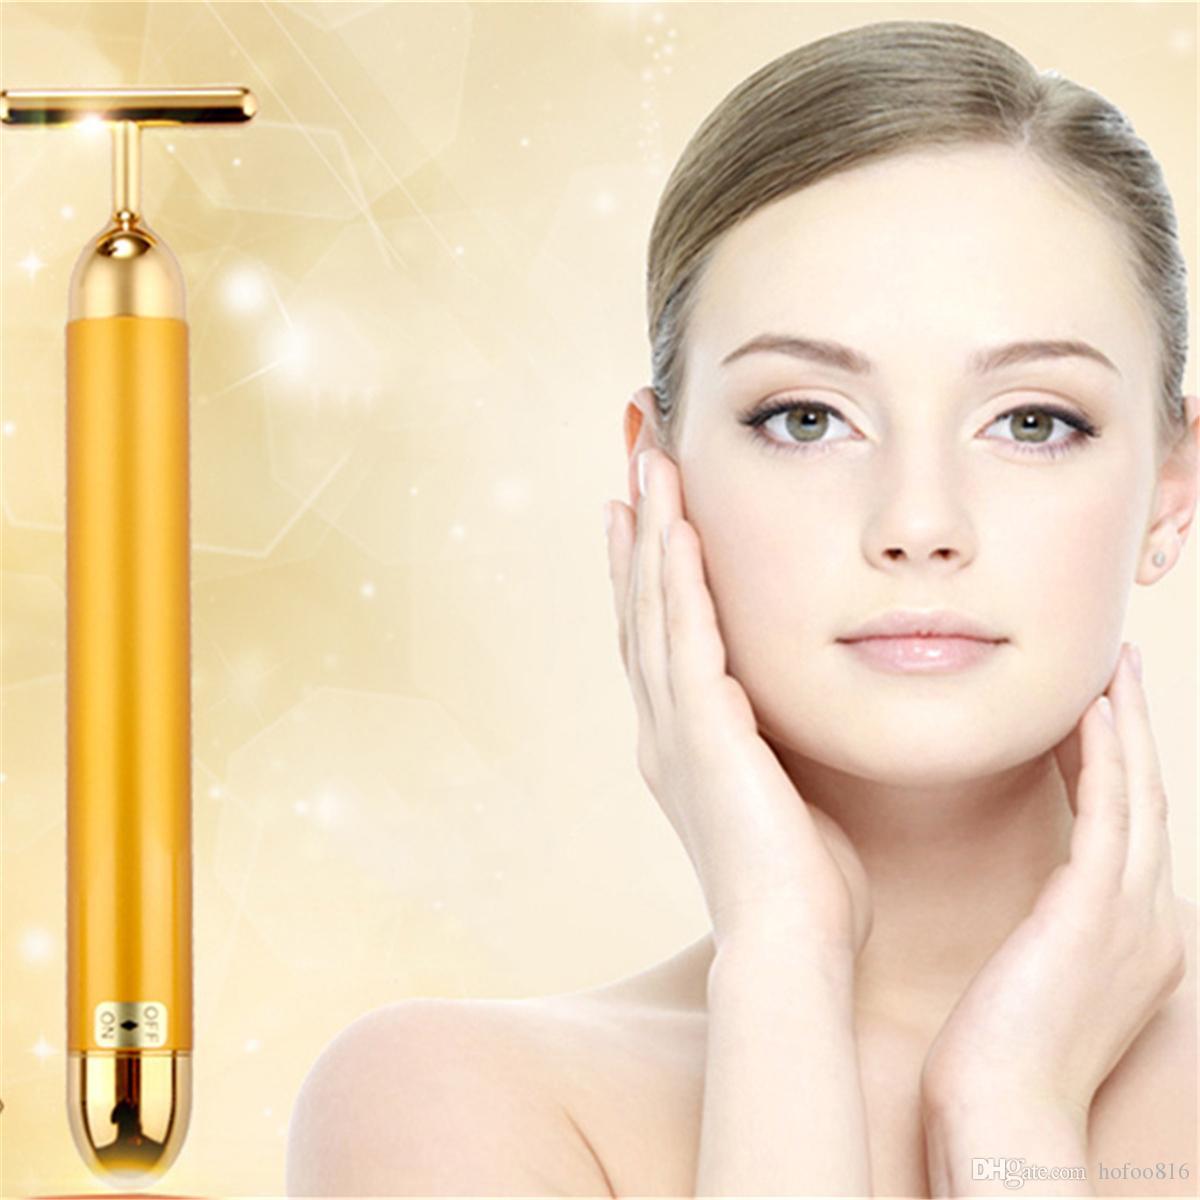 24K золото красоты бар бар электрический ролик вибрации глаз лицо массажер против морщин подтяжка кожи Уход за кожей устройство